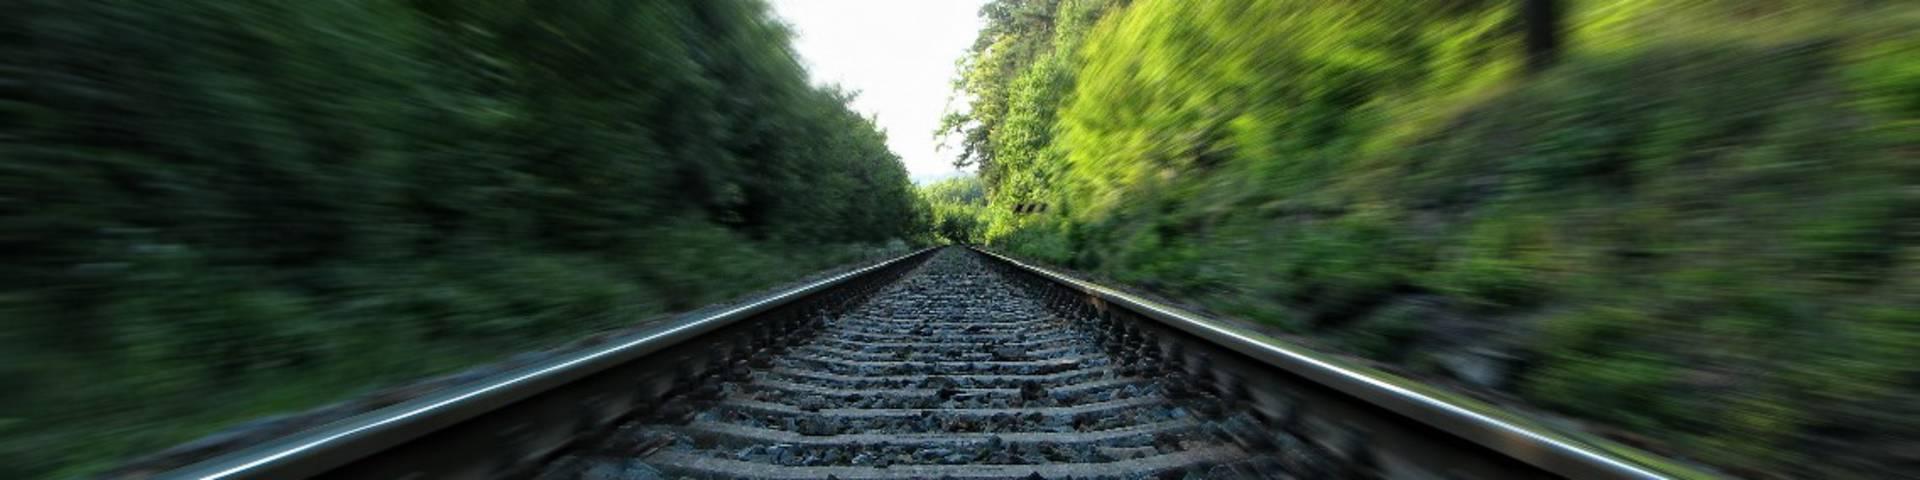 Ligne de chemin de fer en campagne